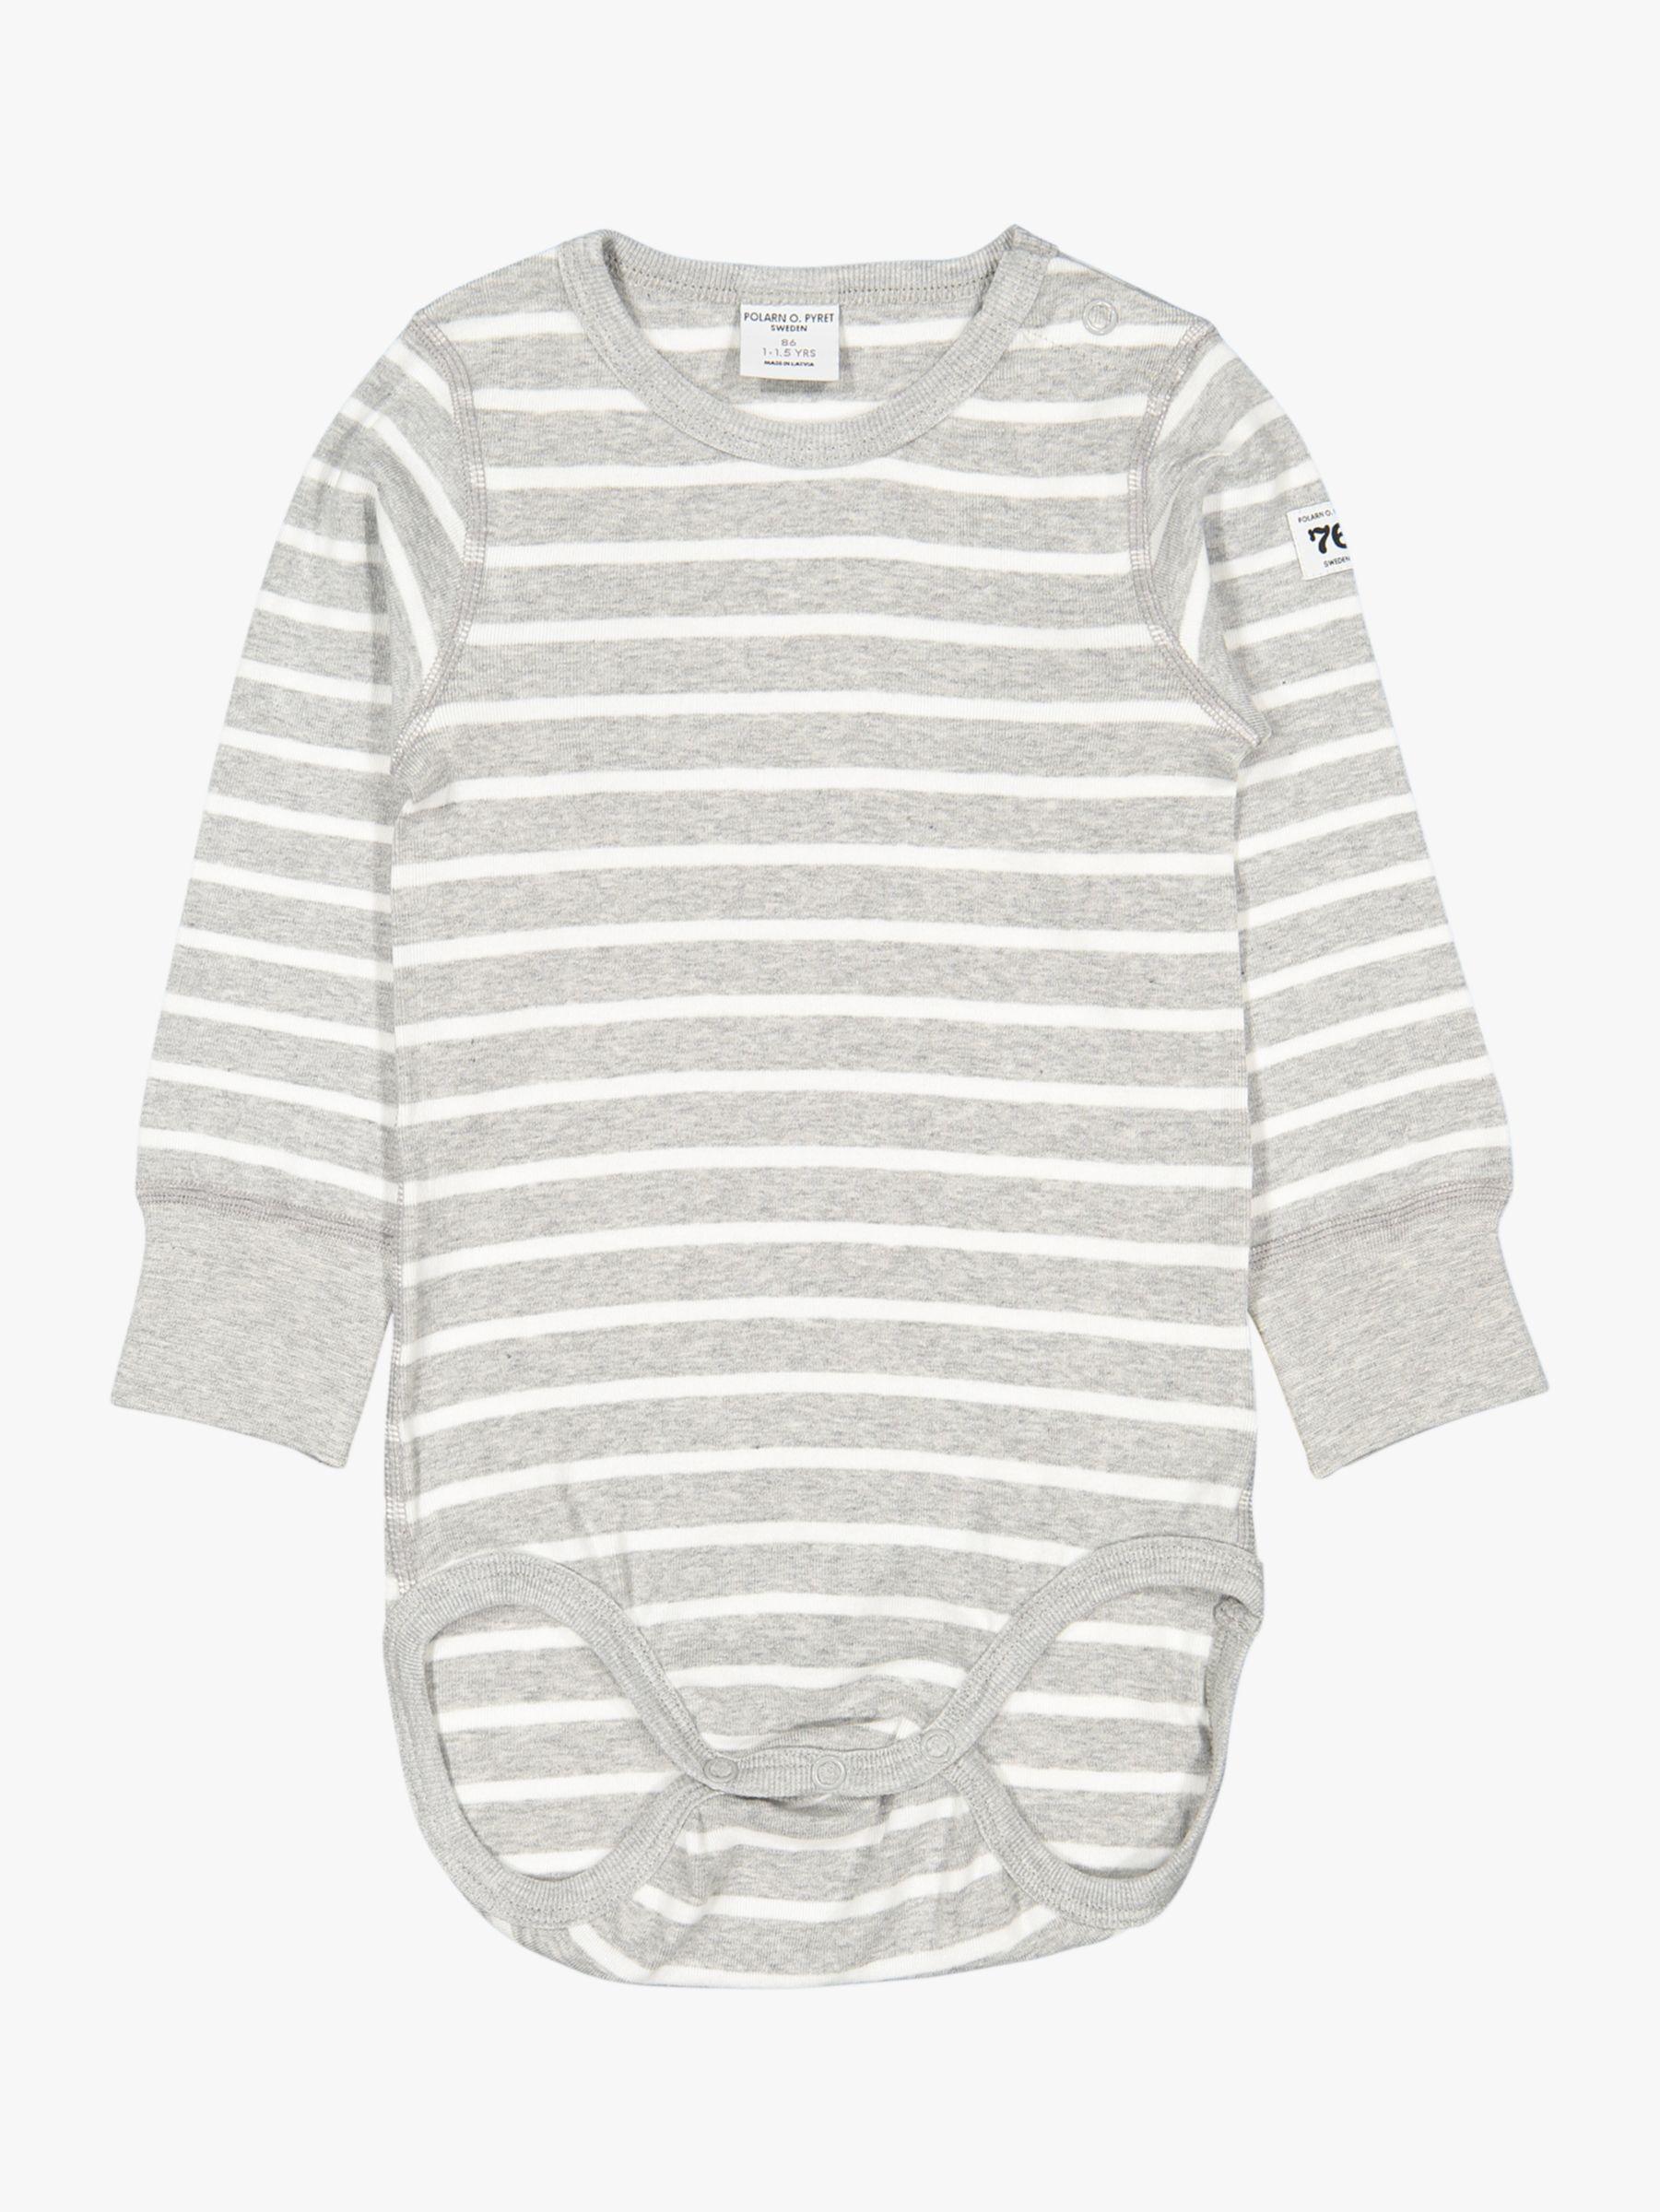 Polarn O. Pyret Polarn O. Pyret Baby GOTS Organic Cotton Stripe Long Sleeve Bodysuit, Grey